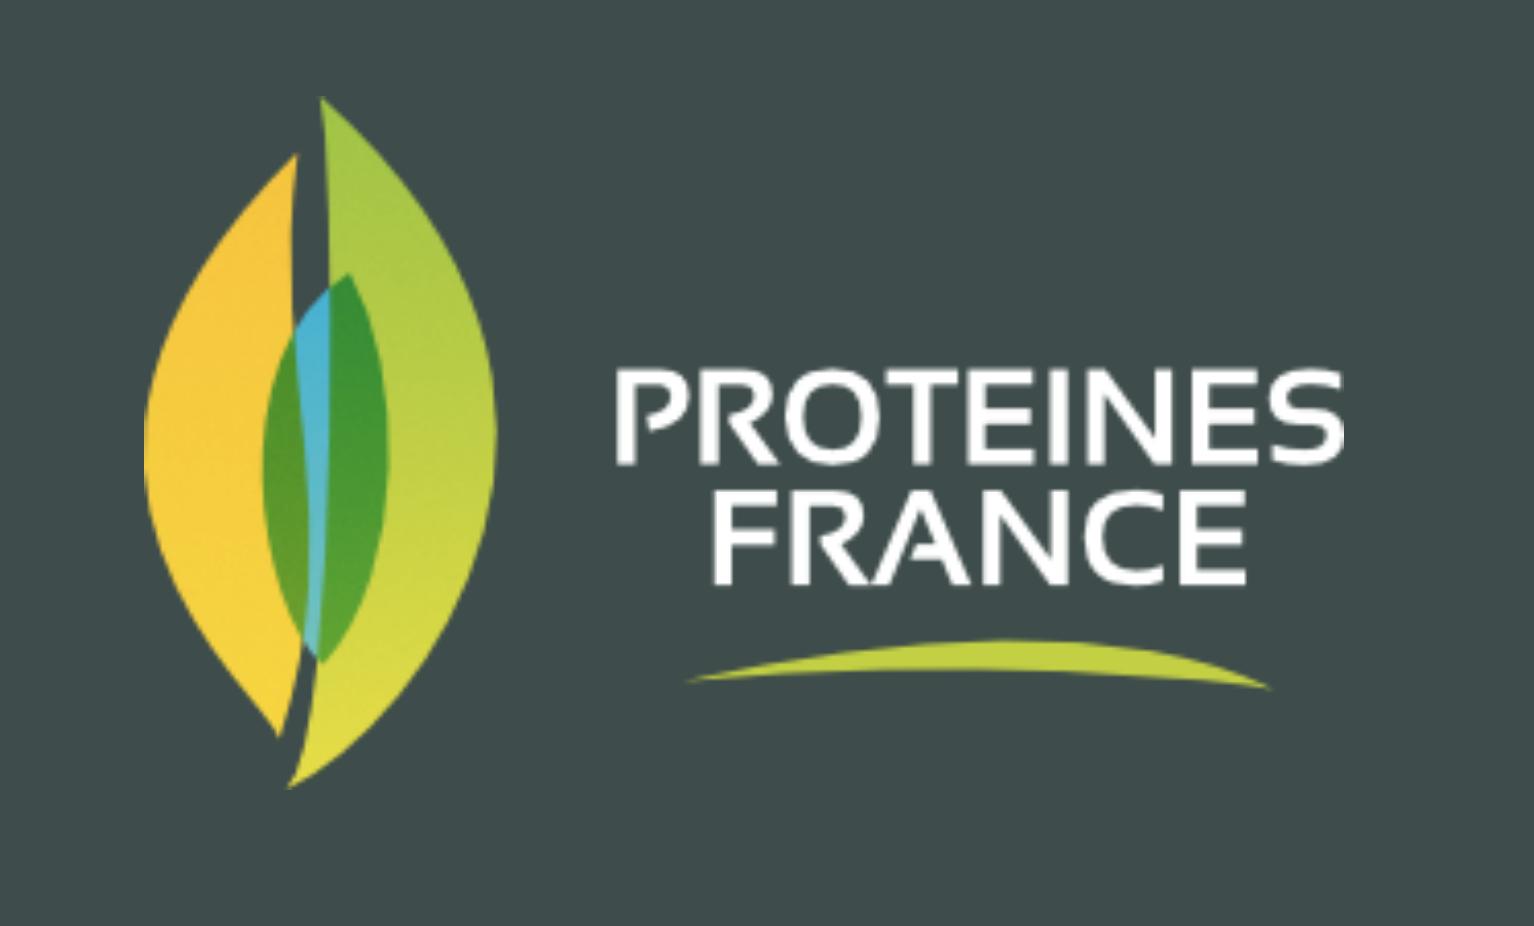 Arbiom joines the Protéines France cluster